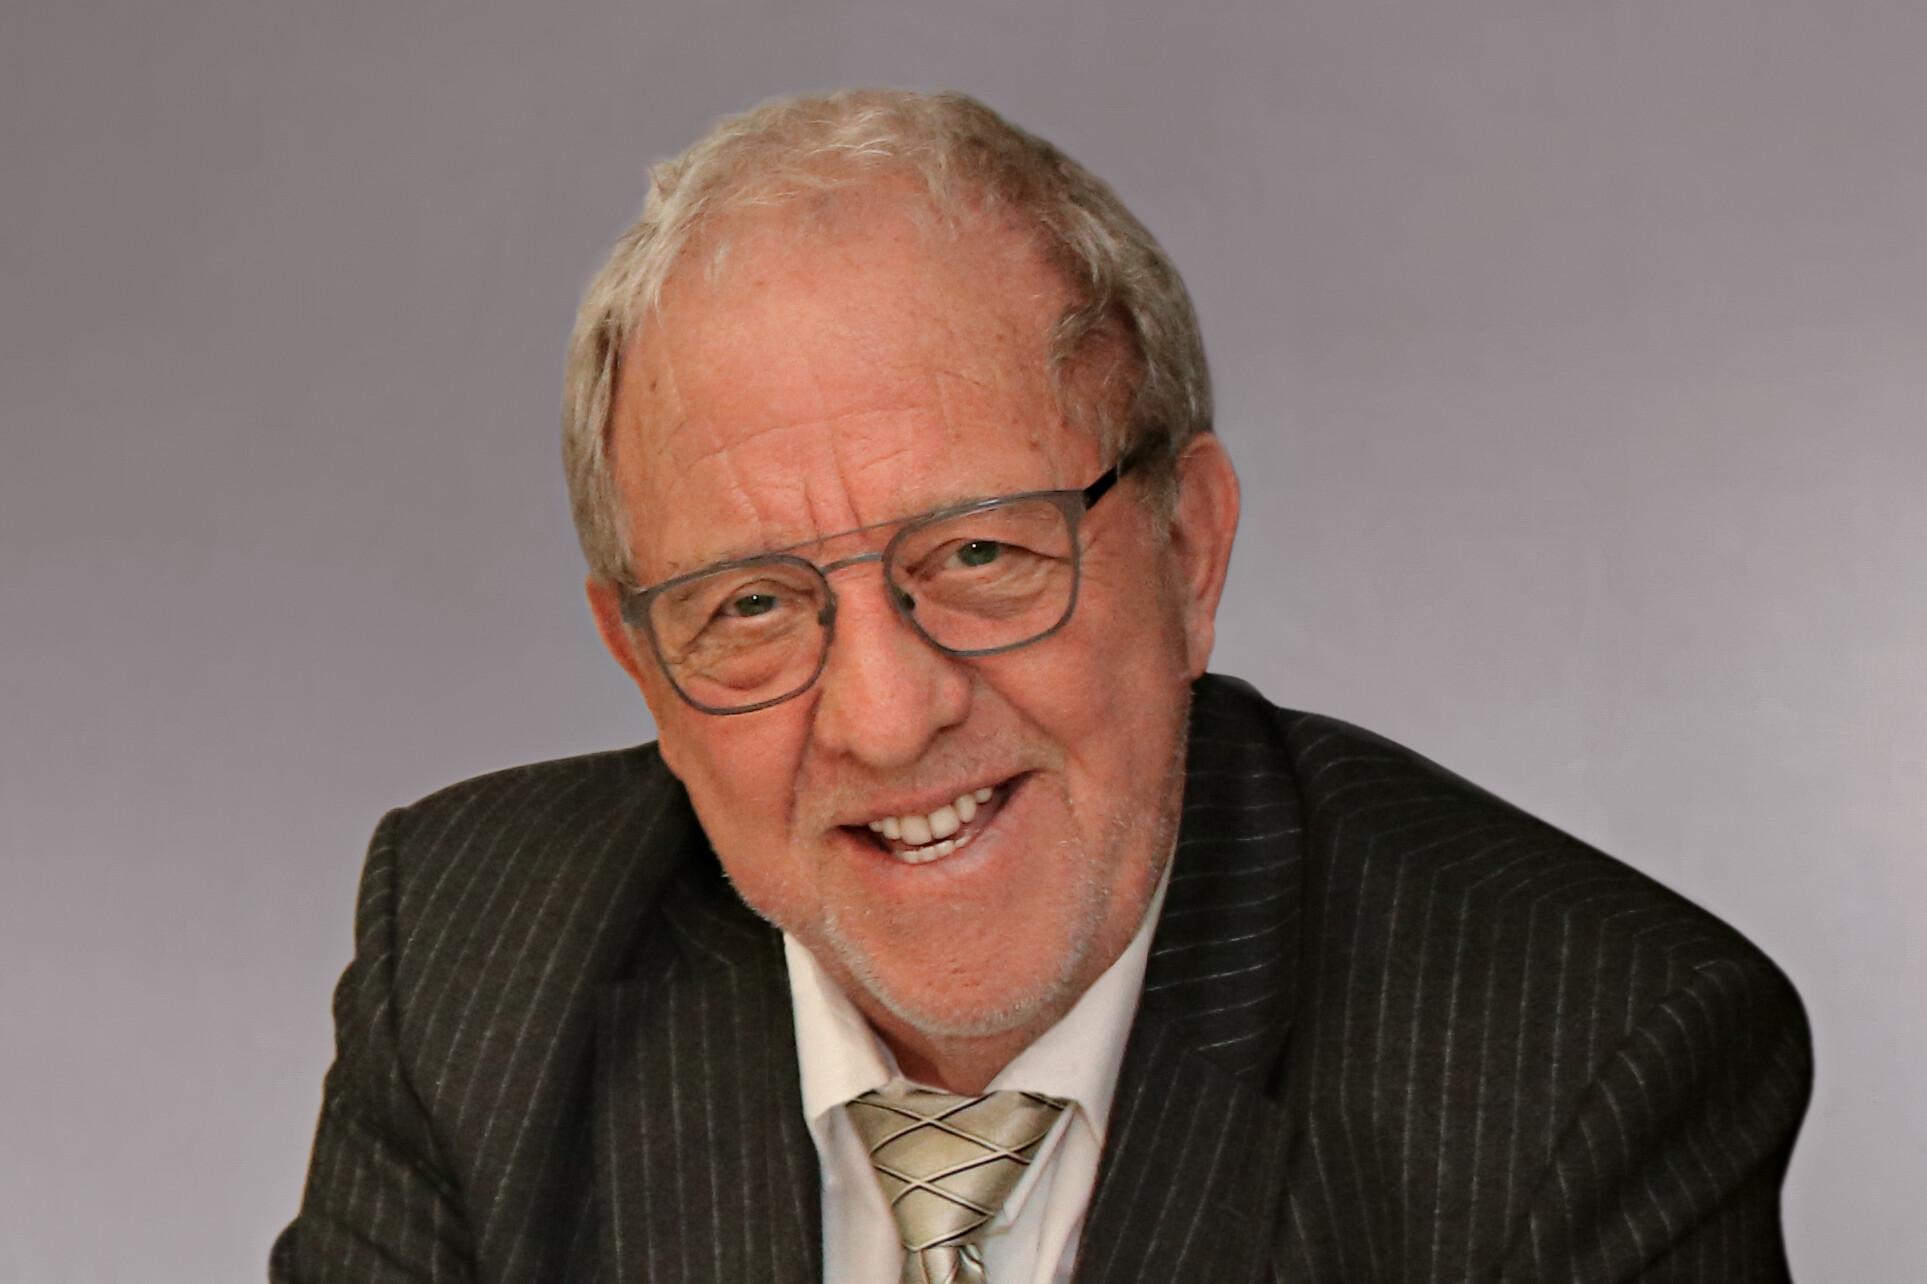 Johannes Schulte